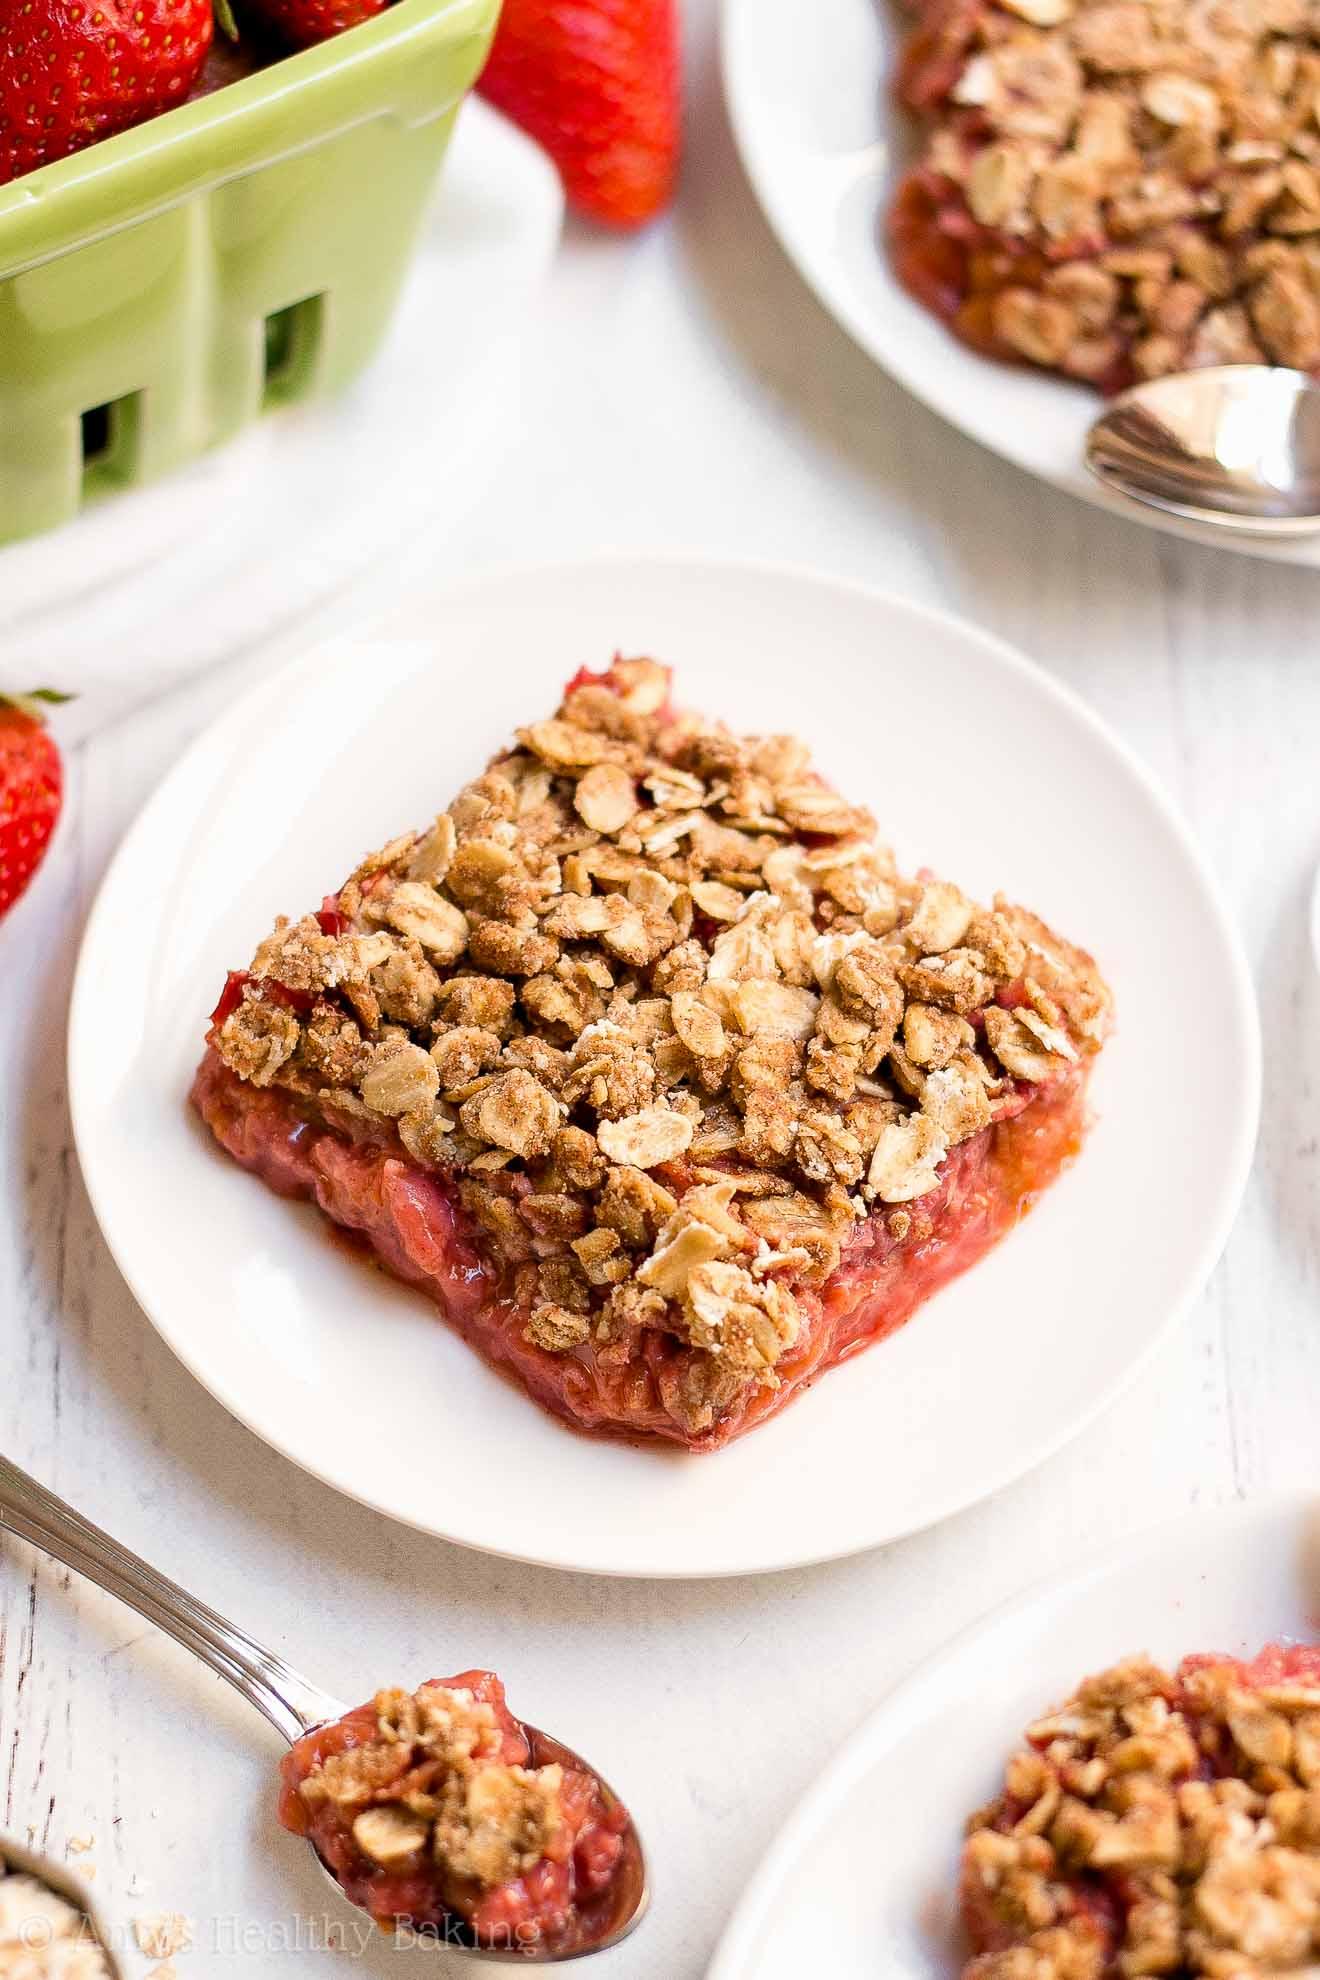 Easy Healthy Gluten Free Strawberry Rhubarb Crumble